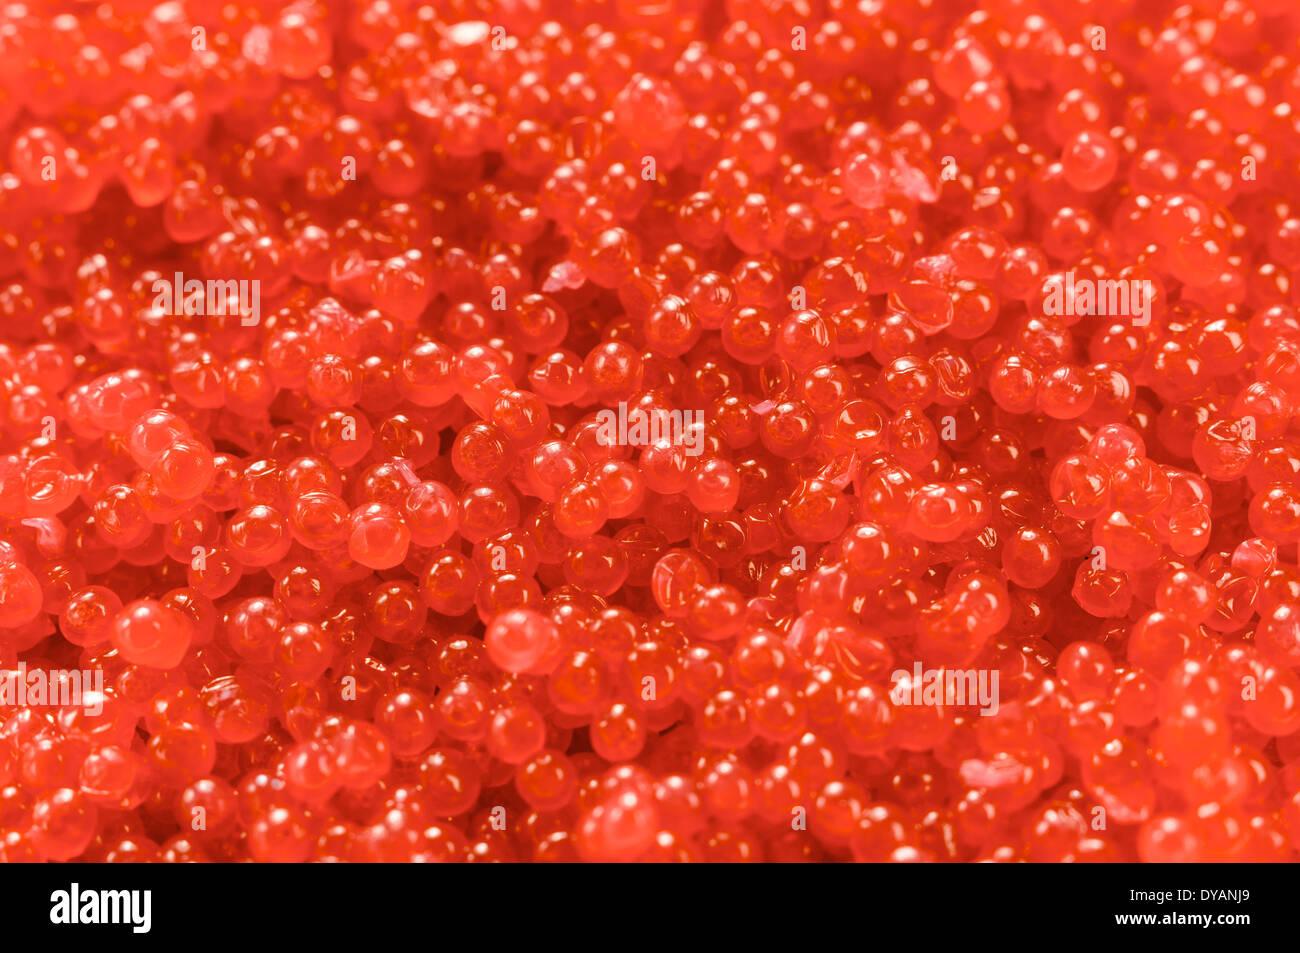 Red caviar closeup. The eggs are small. - Stock Image